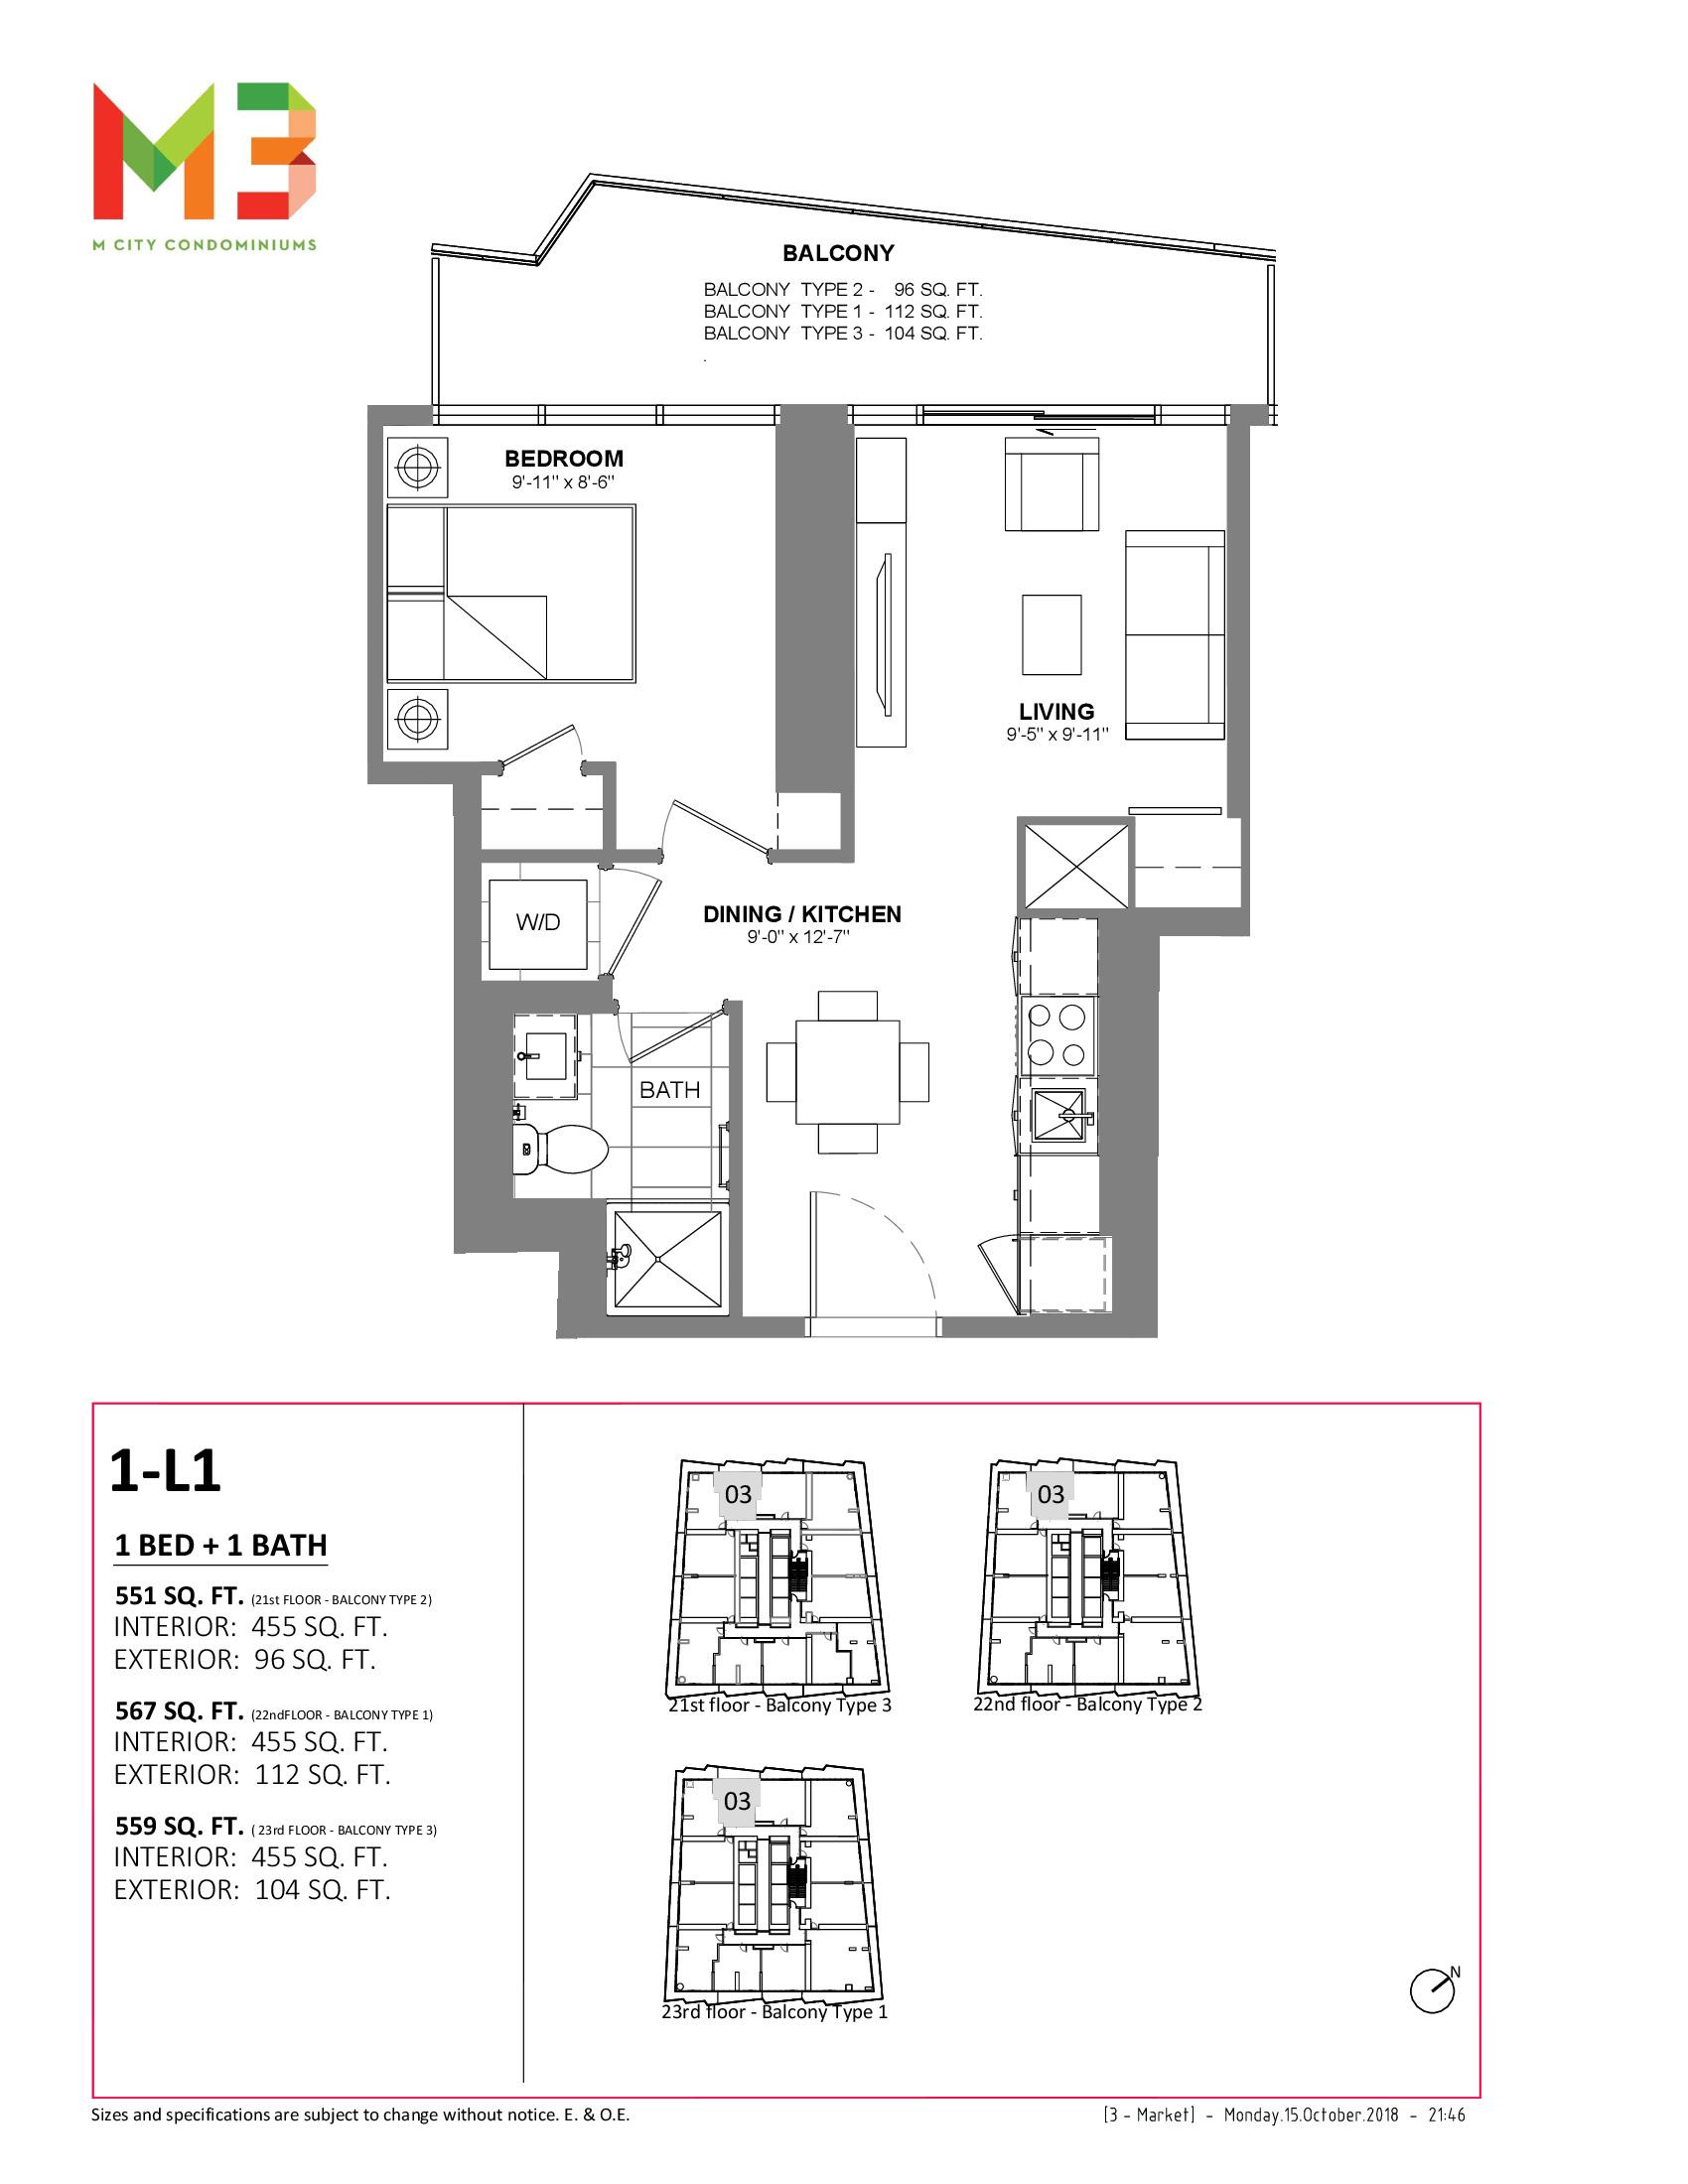 1-L1 Floor Plan at M3 Condos - 455 sq.ft